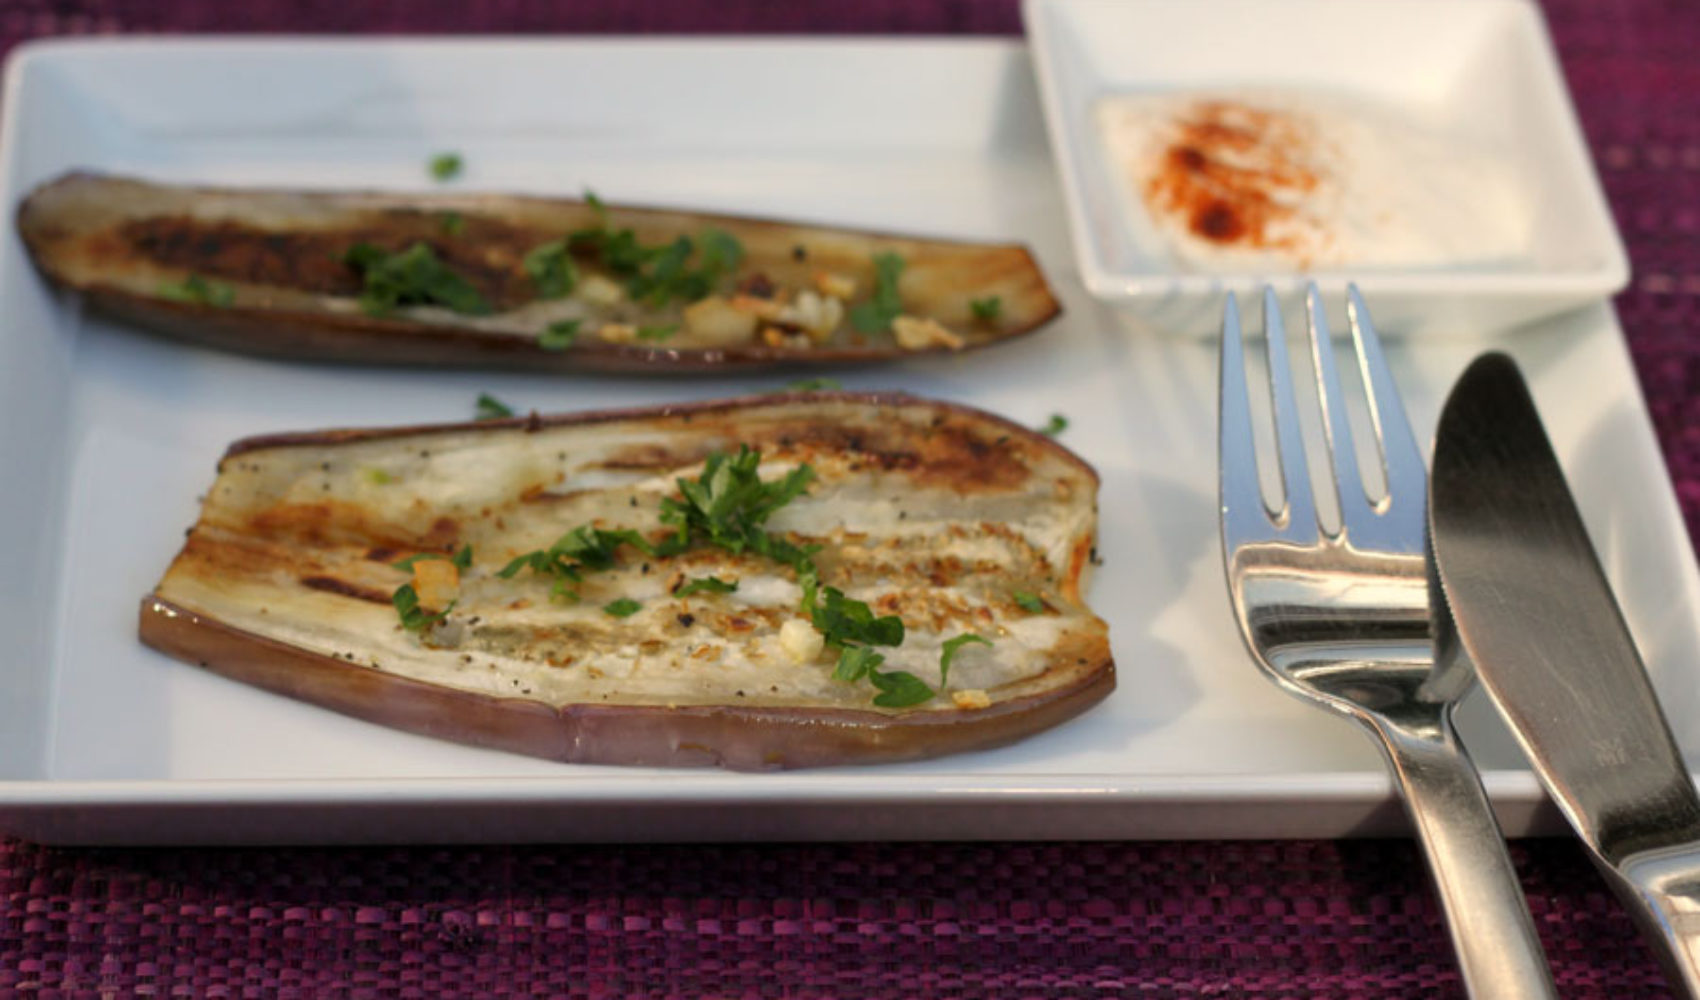 Die Farbe lila schmeckt: Auberginen mit Joghurt-Tahini-Soße